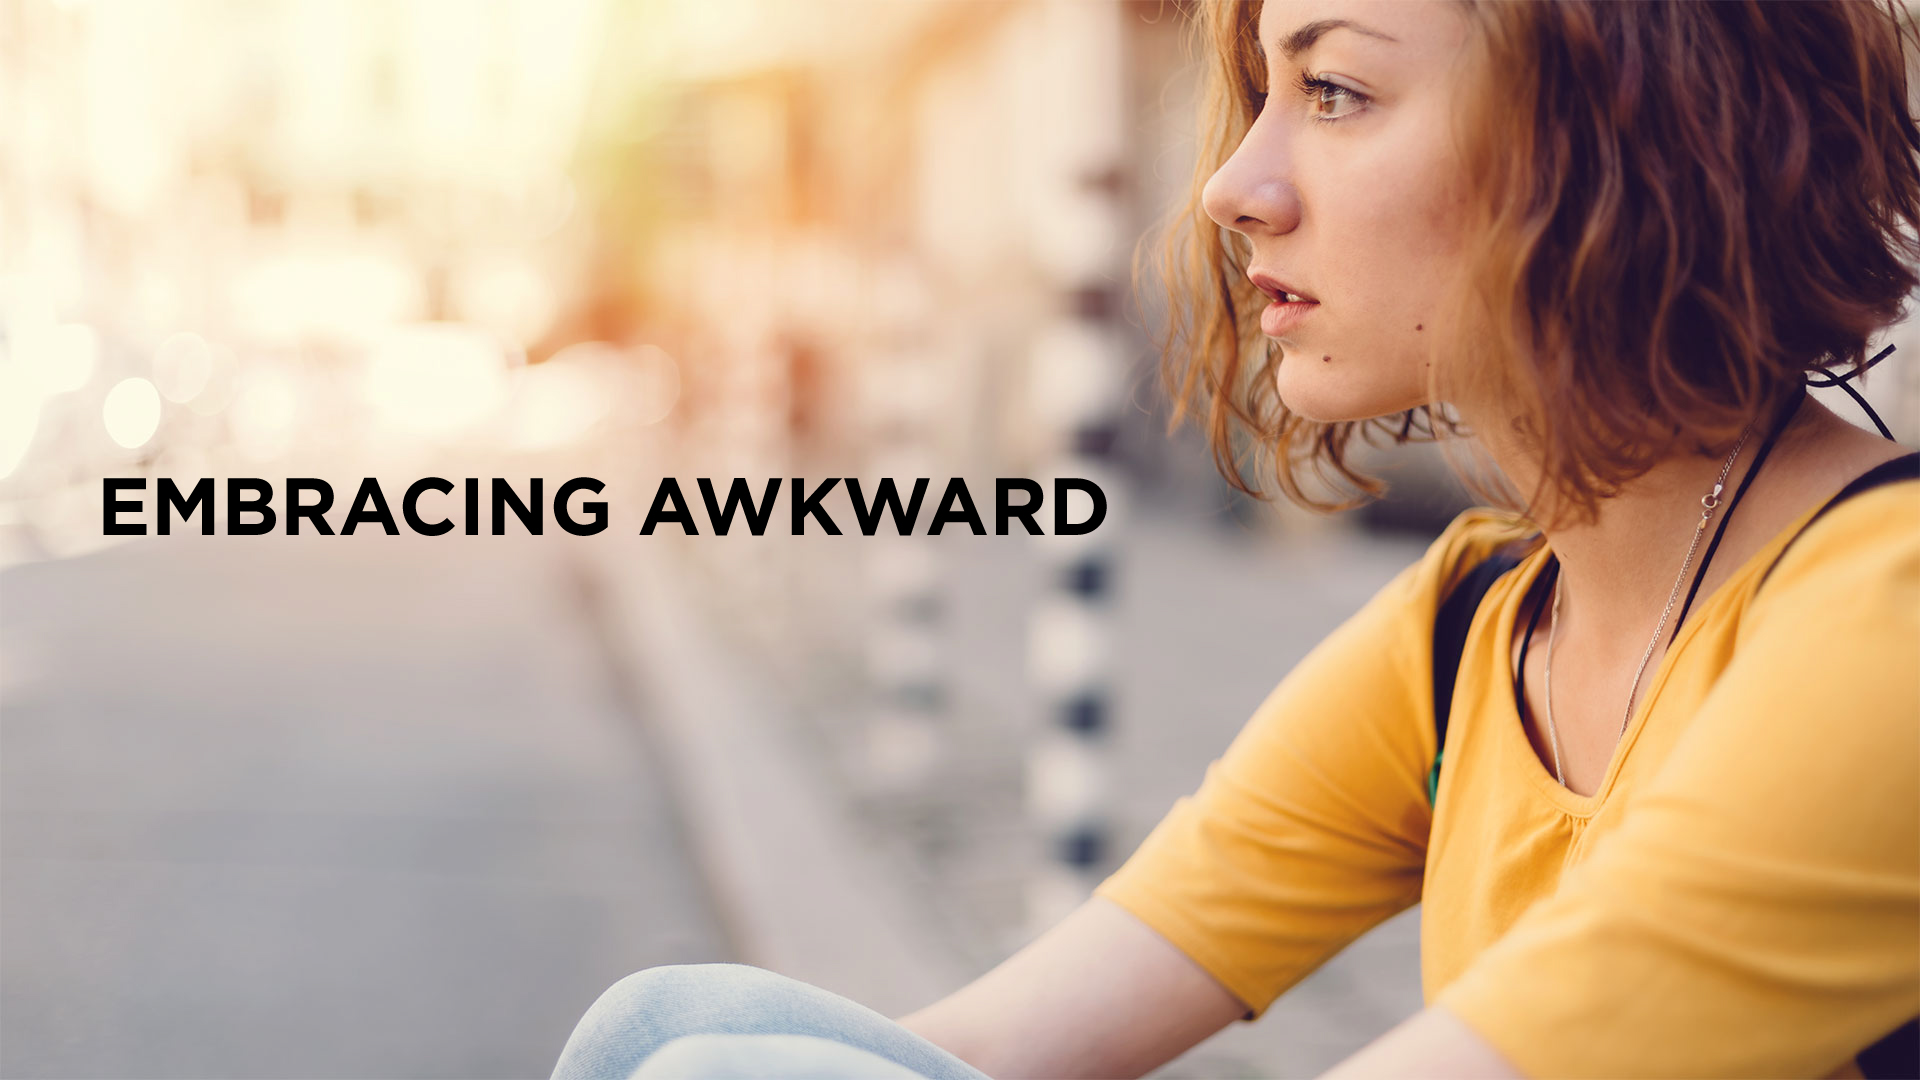 Embracing Awkward